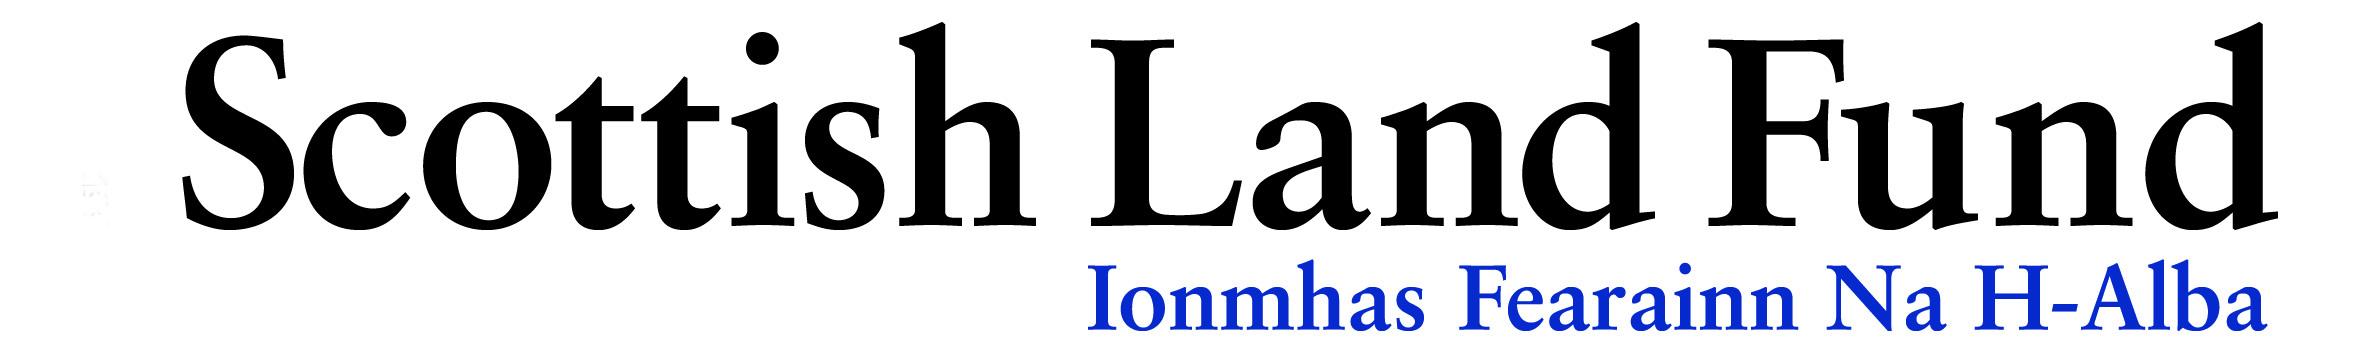 Scottish Land Fund Logo